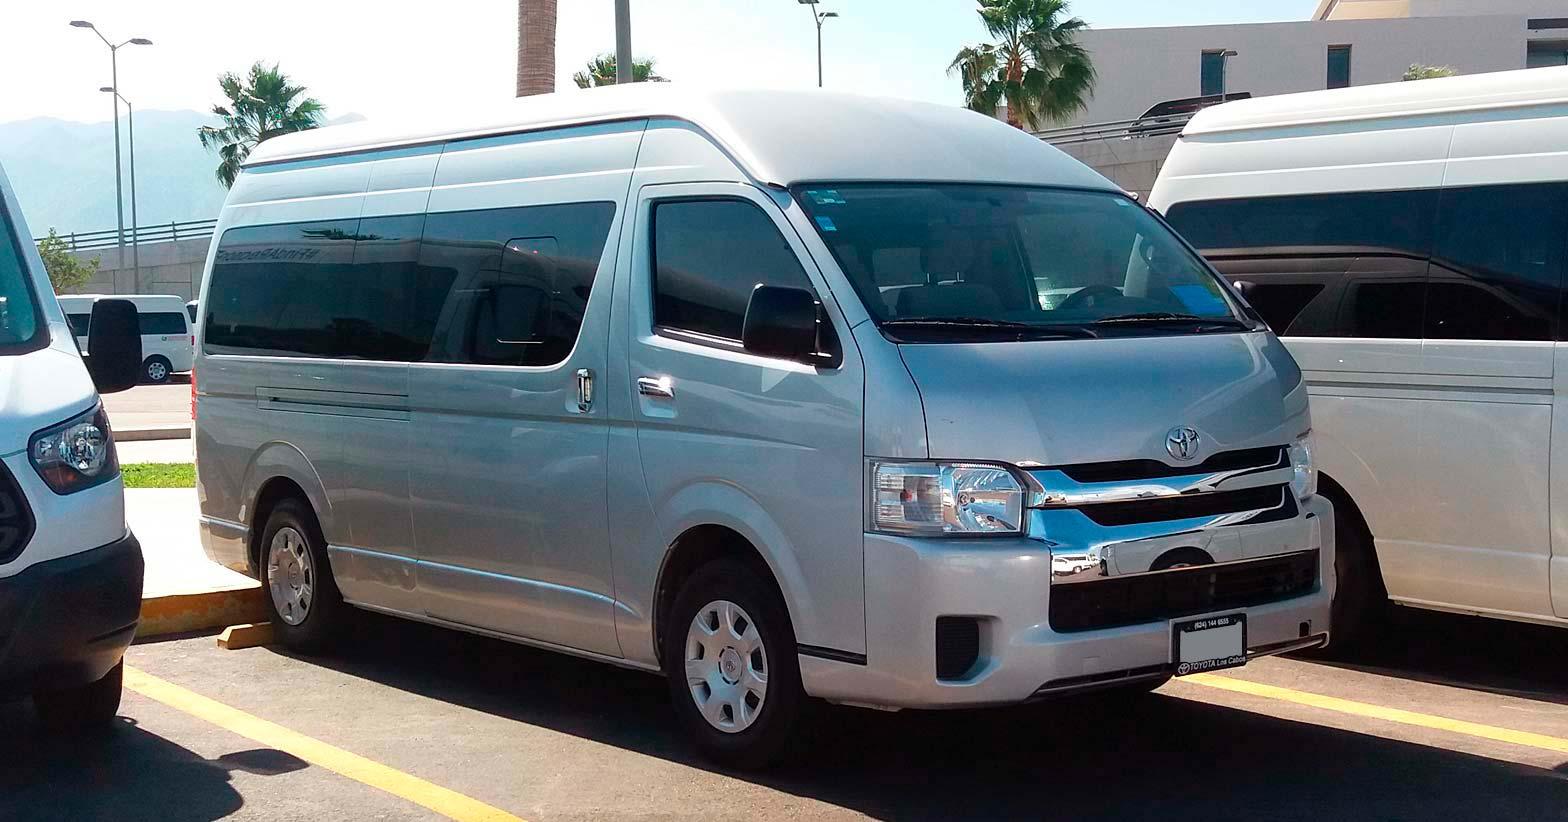 Vans - Airport Shuttle Transportation - Los Cabos, Cabo San Lucas, San Jose del Cabo